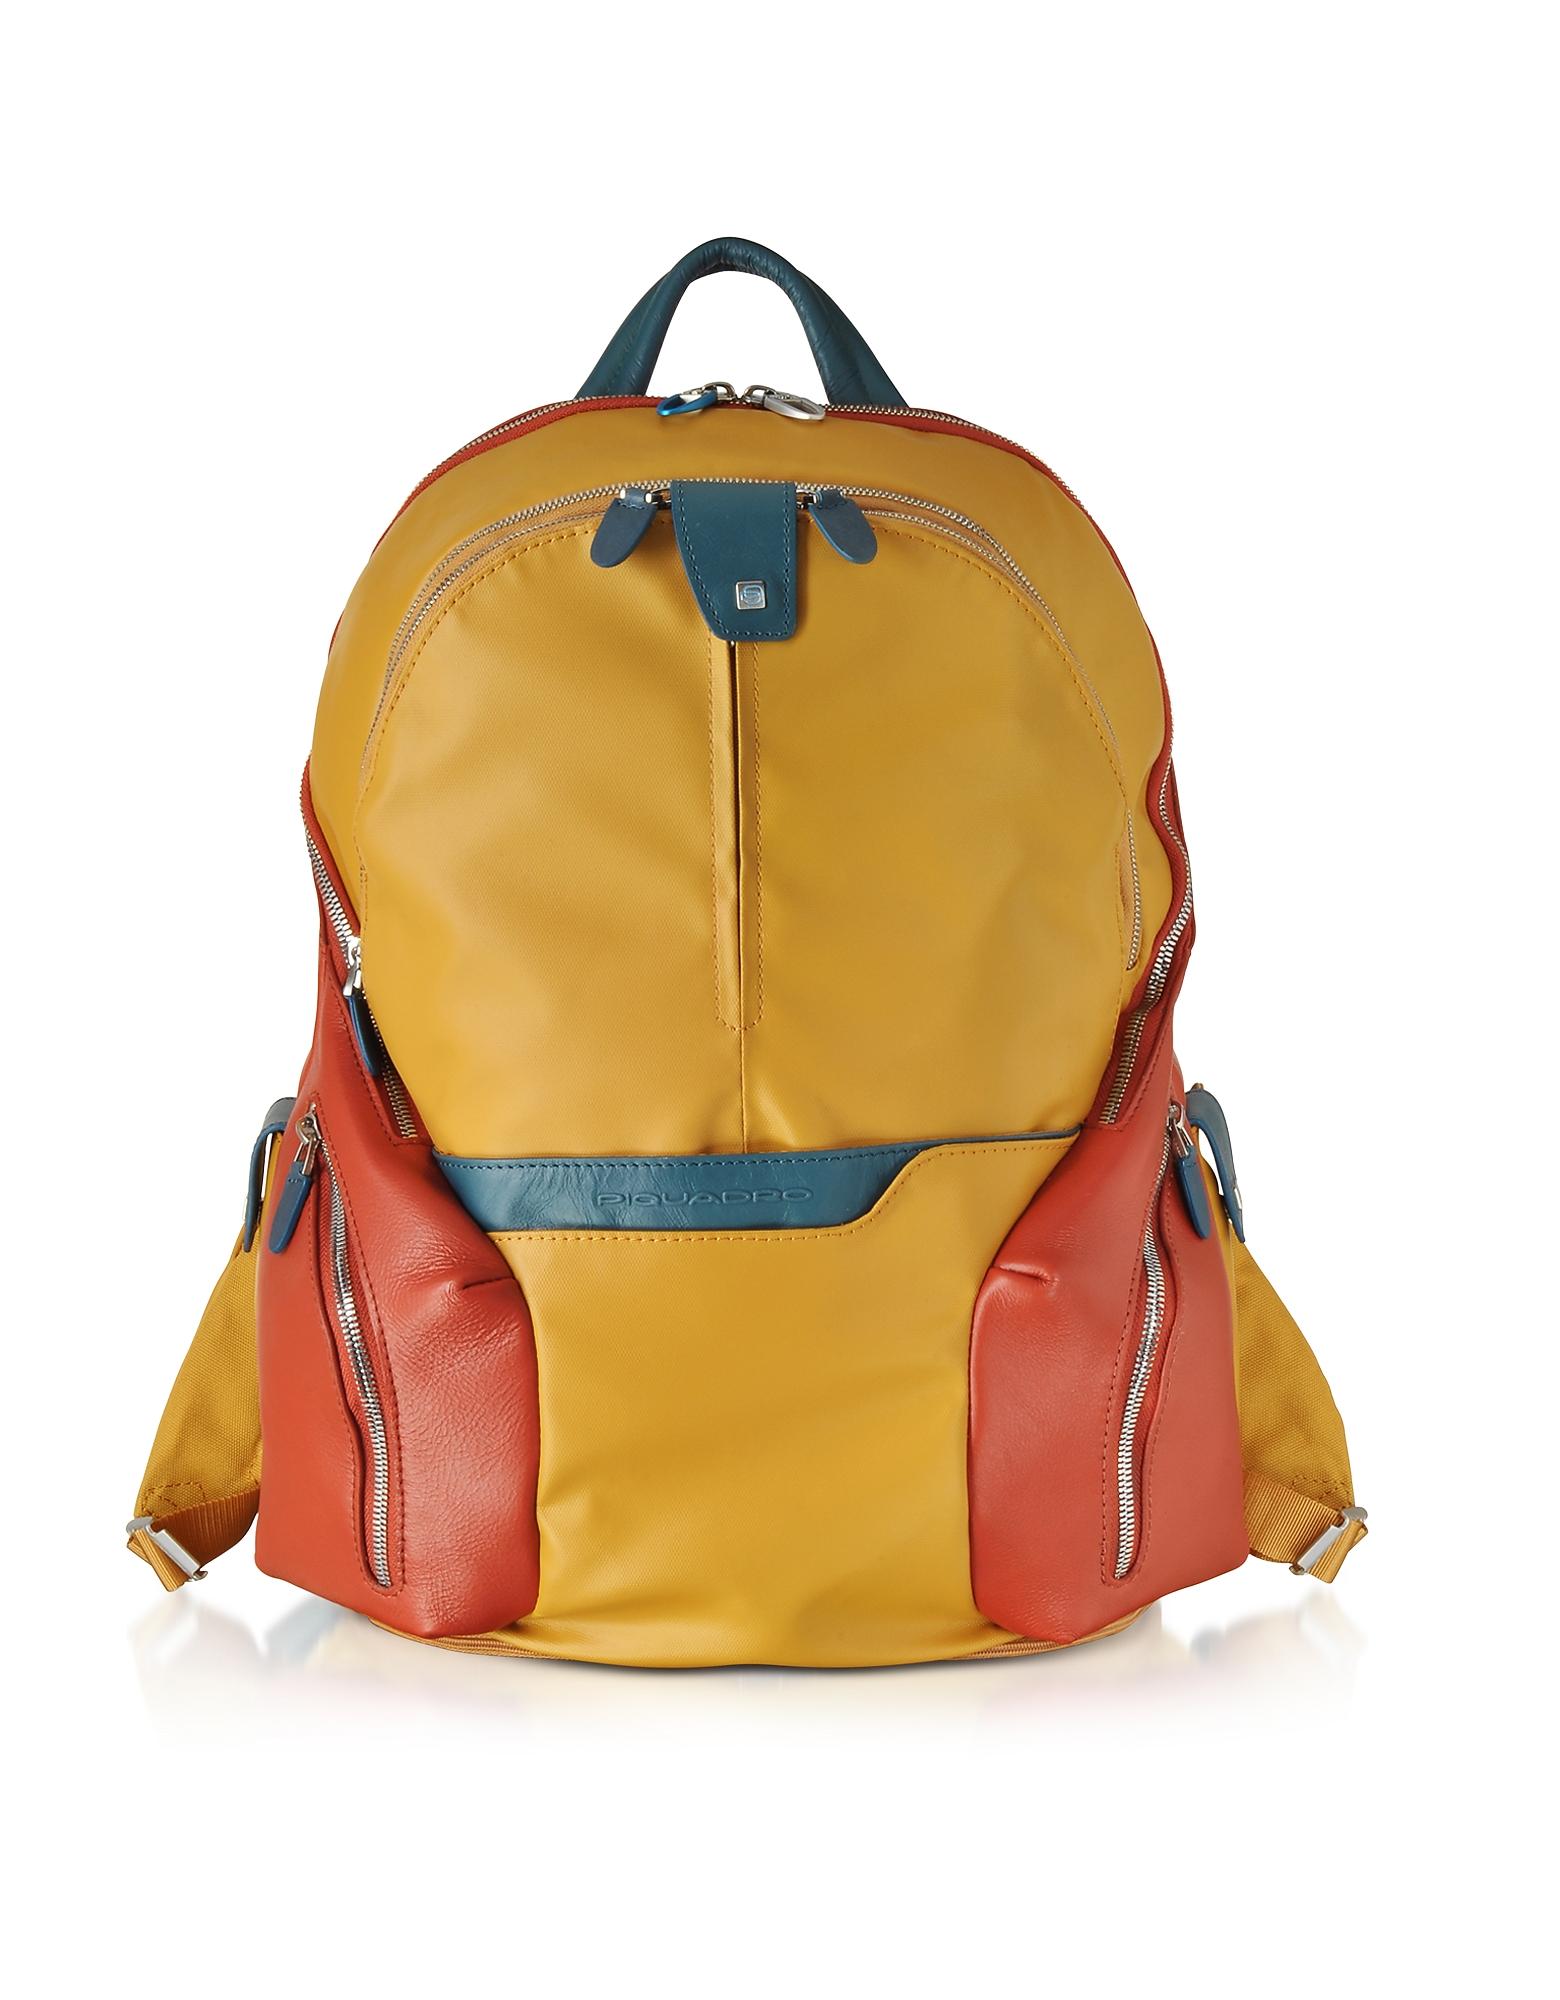 Piquadro Backpacks, Nylon & Leather Computer Backpack